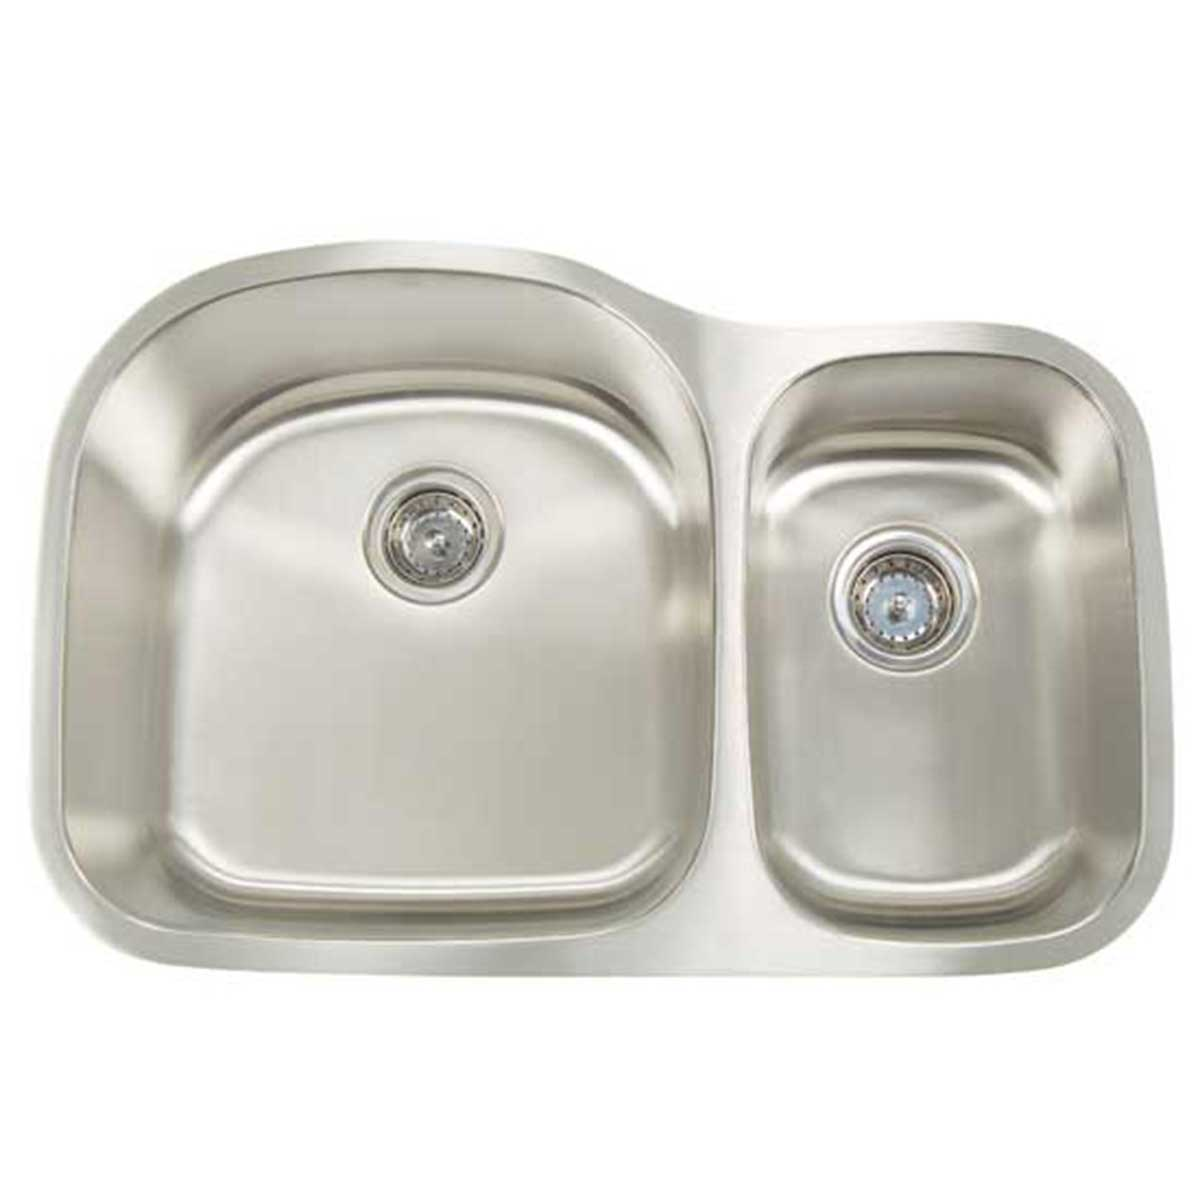 ... Artisan Sinks Double Bowl Sinks ...